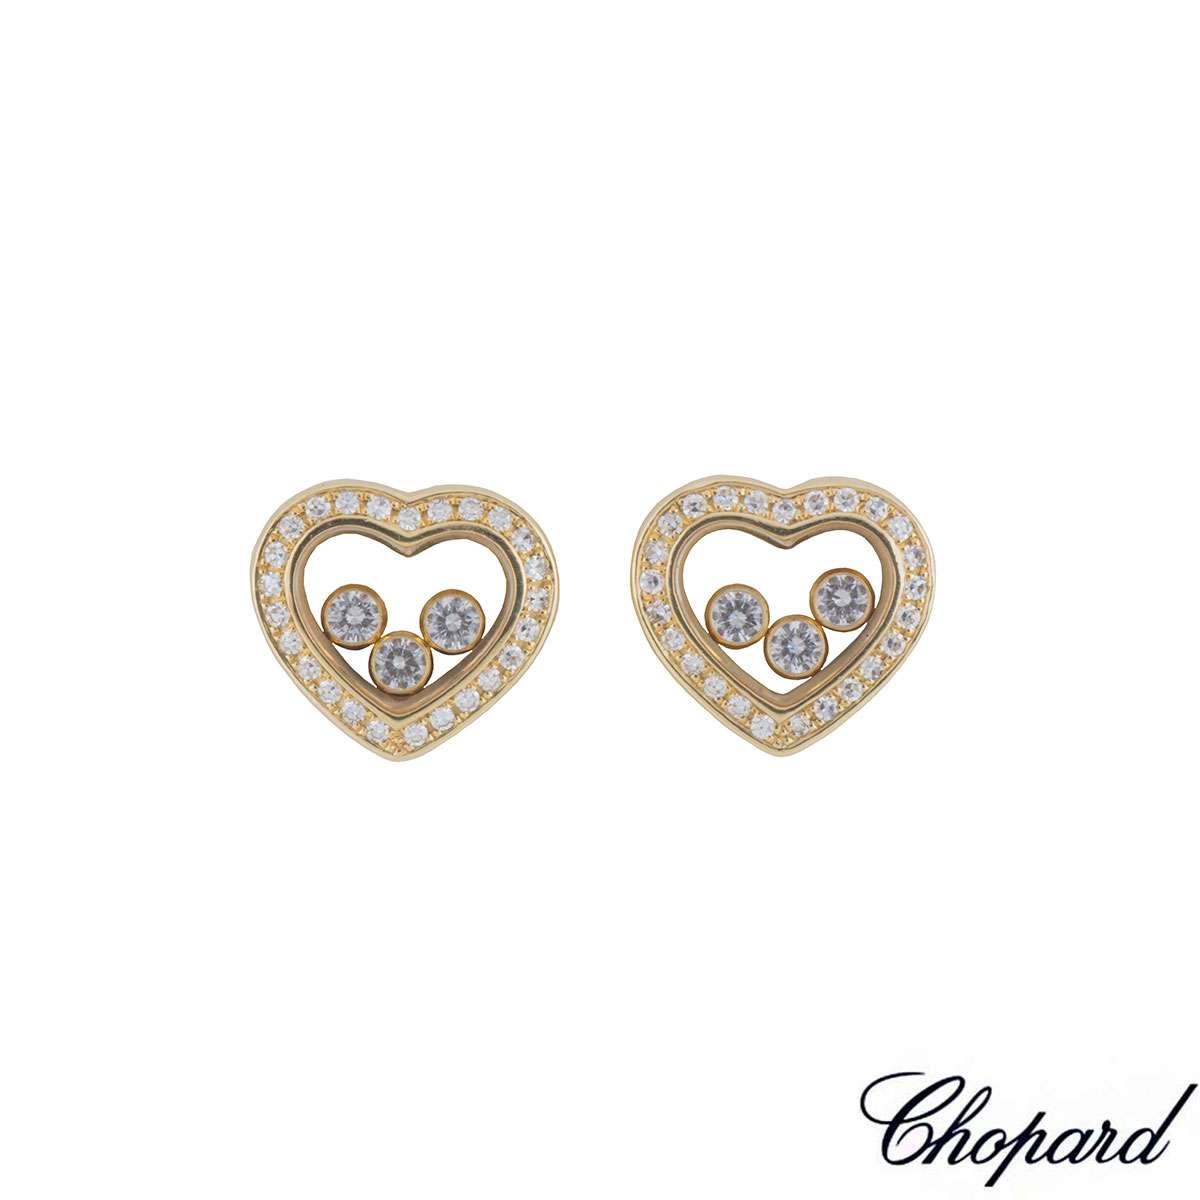 Chopard Yellow Gold Happy Curves Diamond Earrings